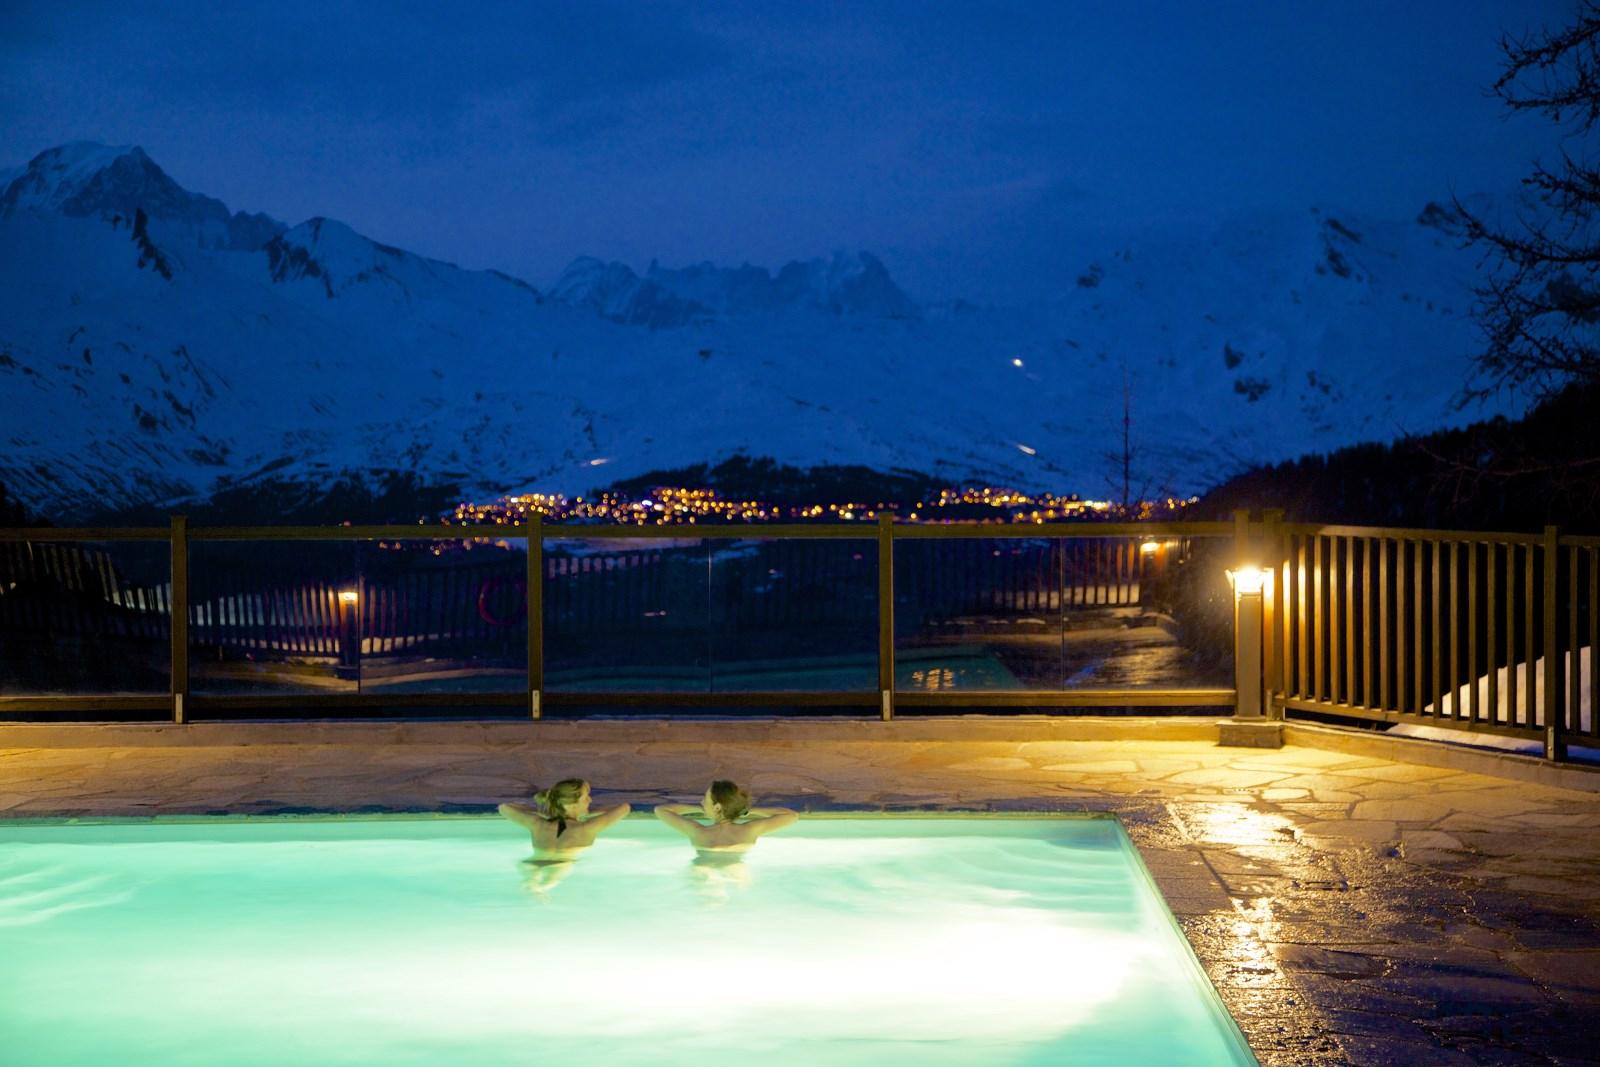 hotel avec spa en montagne residence de vacances en station ski avec piscine les arcs arc 1950. Black Bedroom Furniture Sets. Home Design Ideas